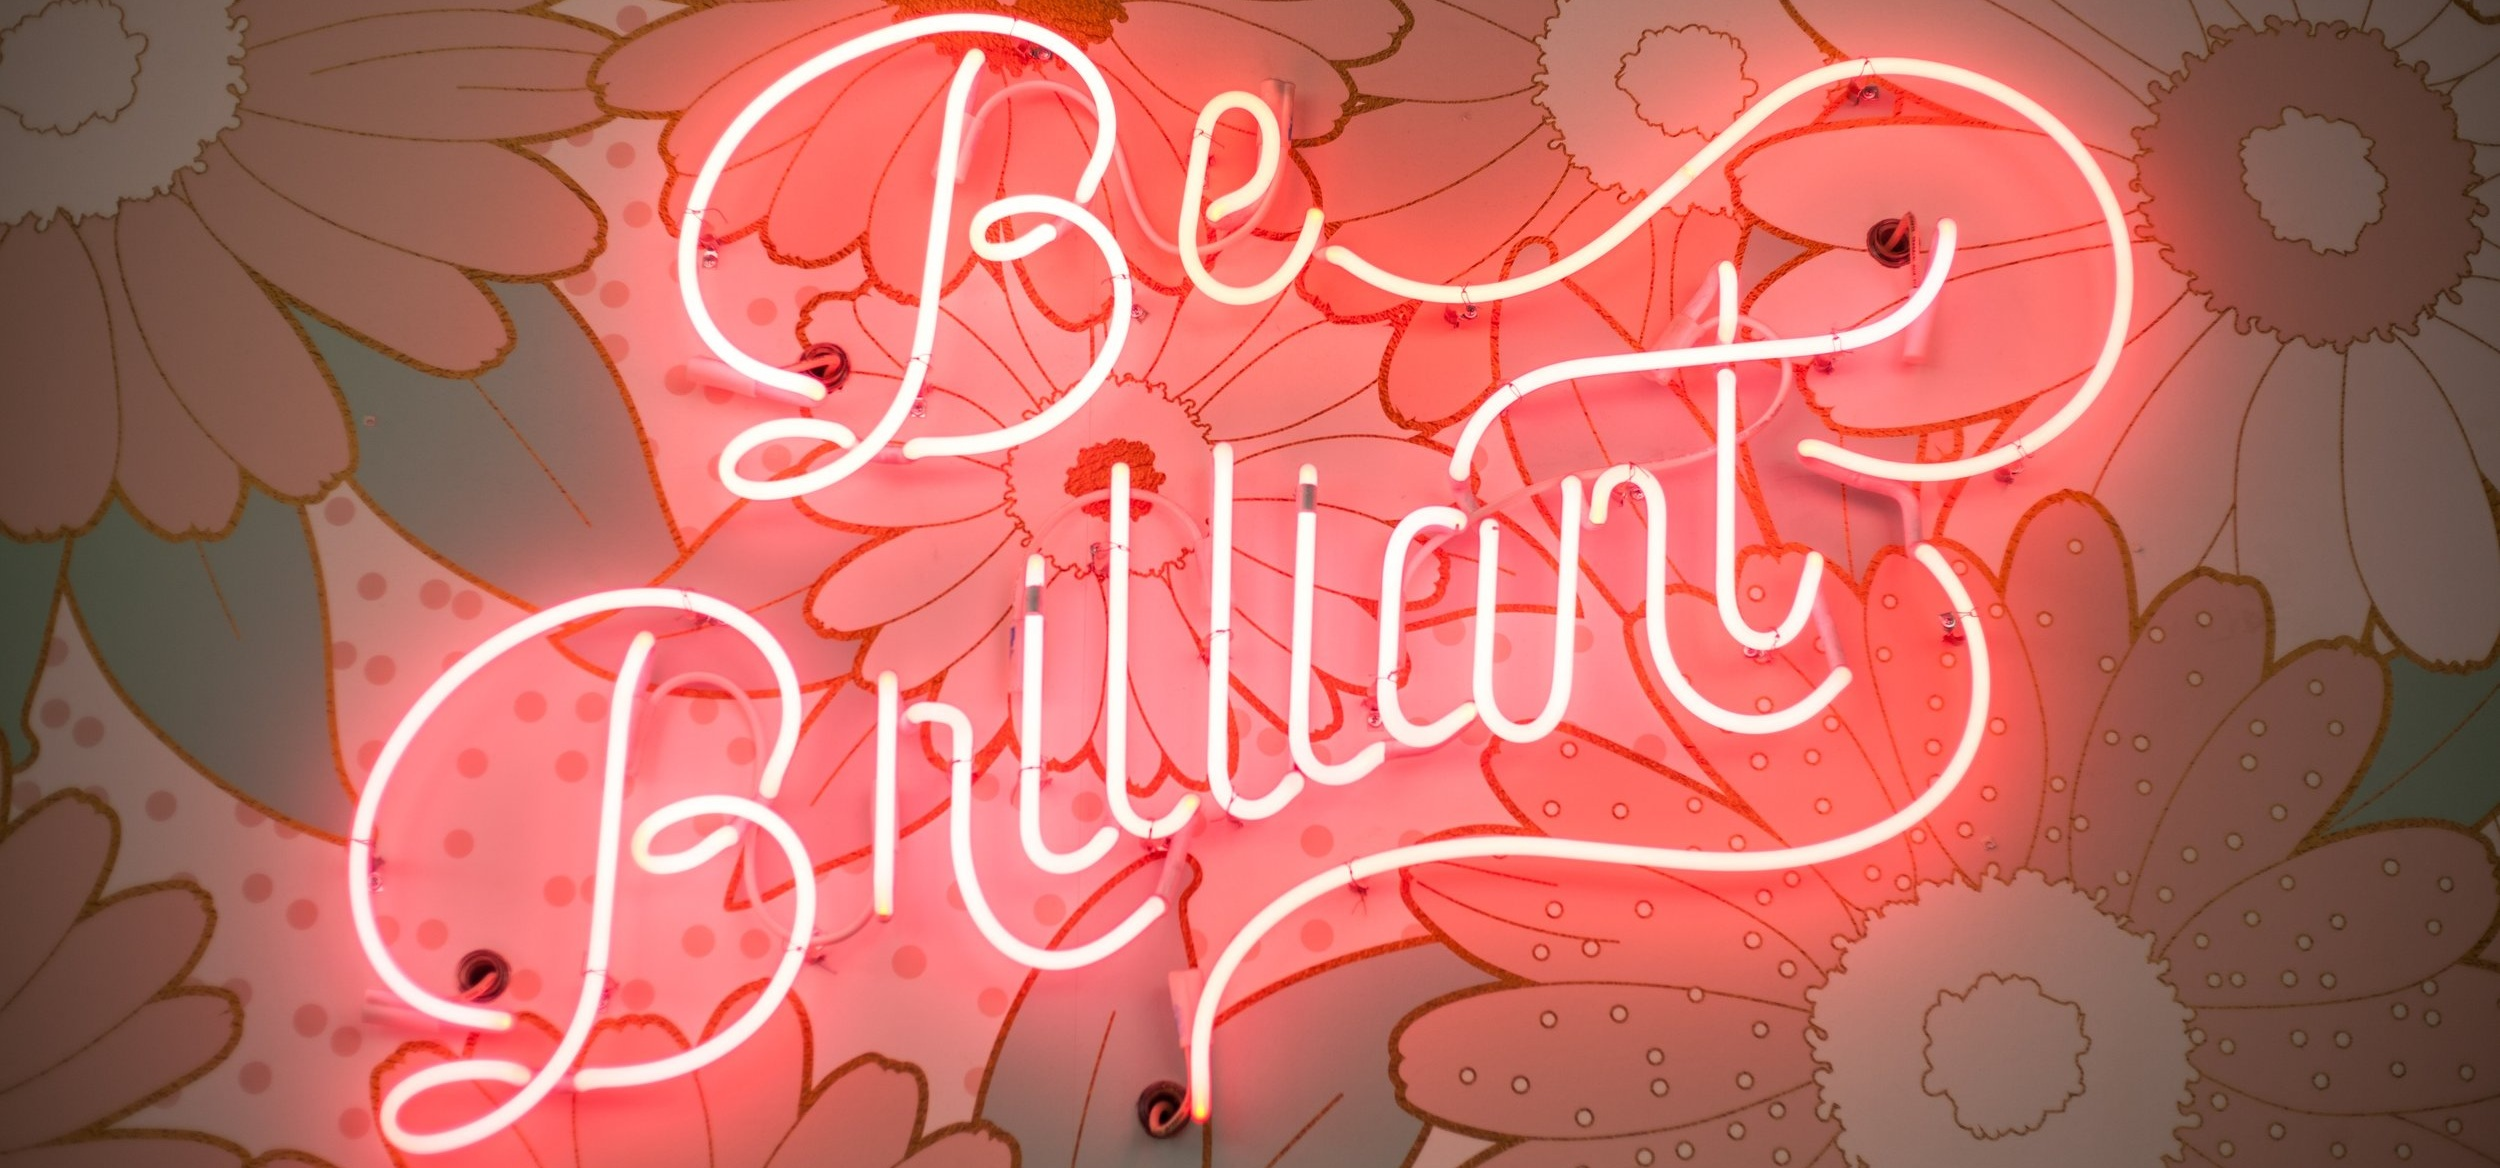 Be-Brilliant.jpg